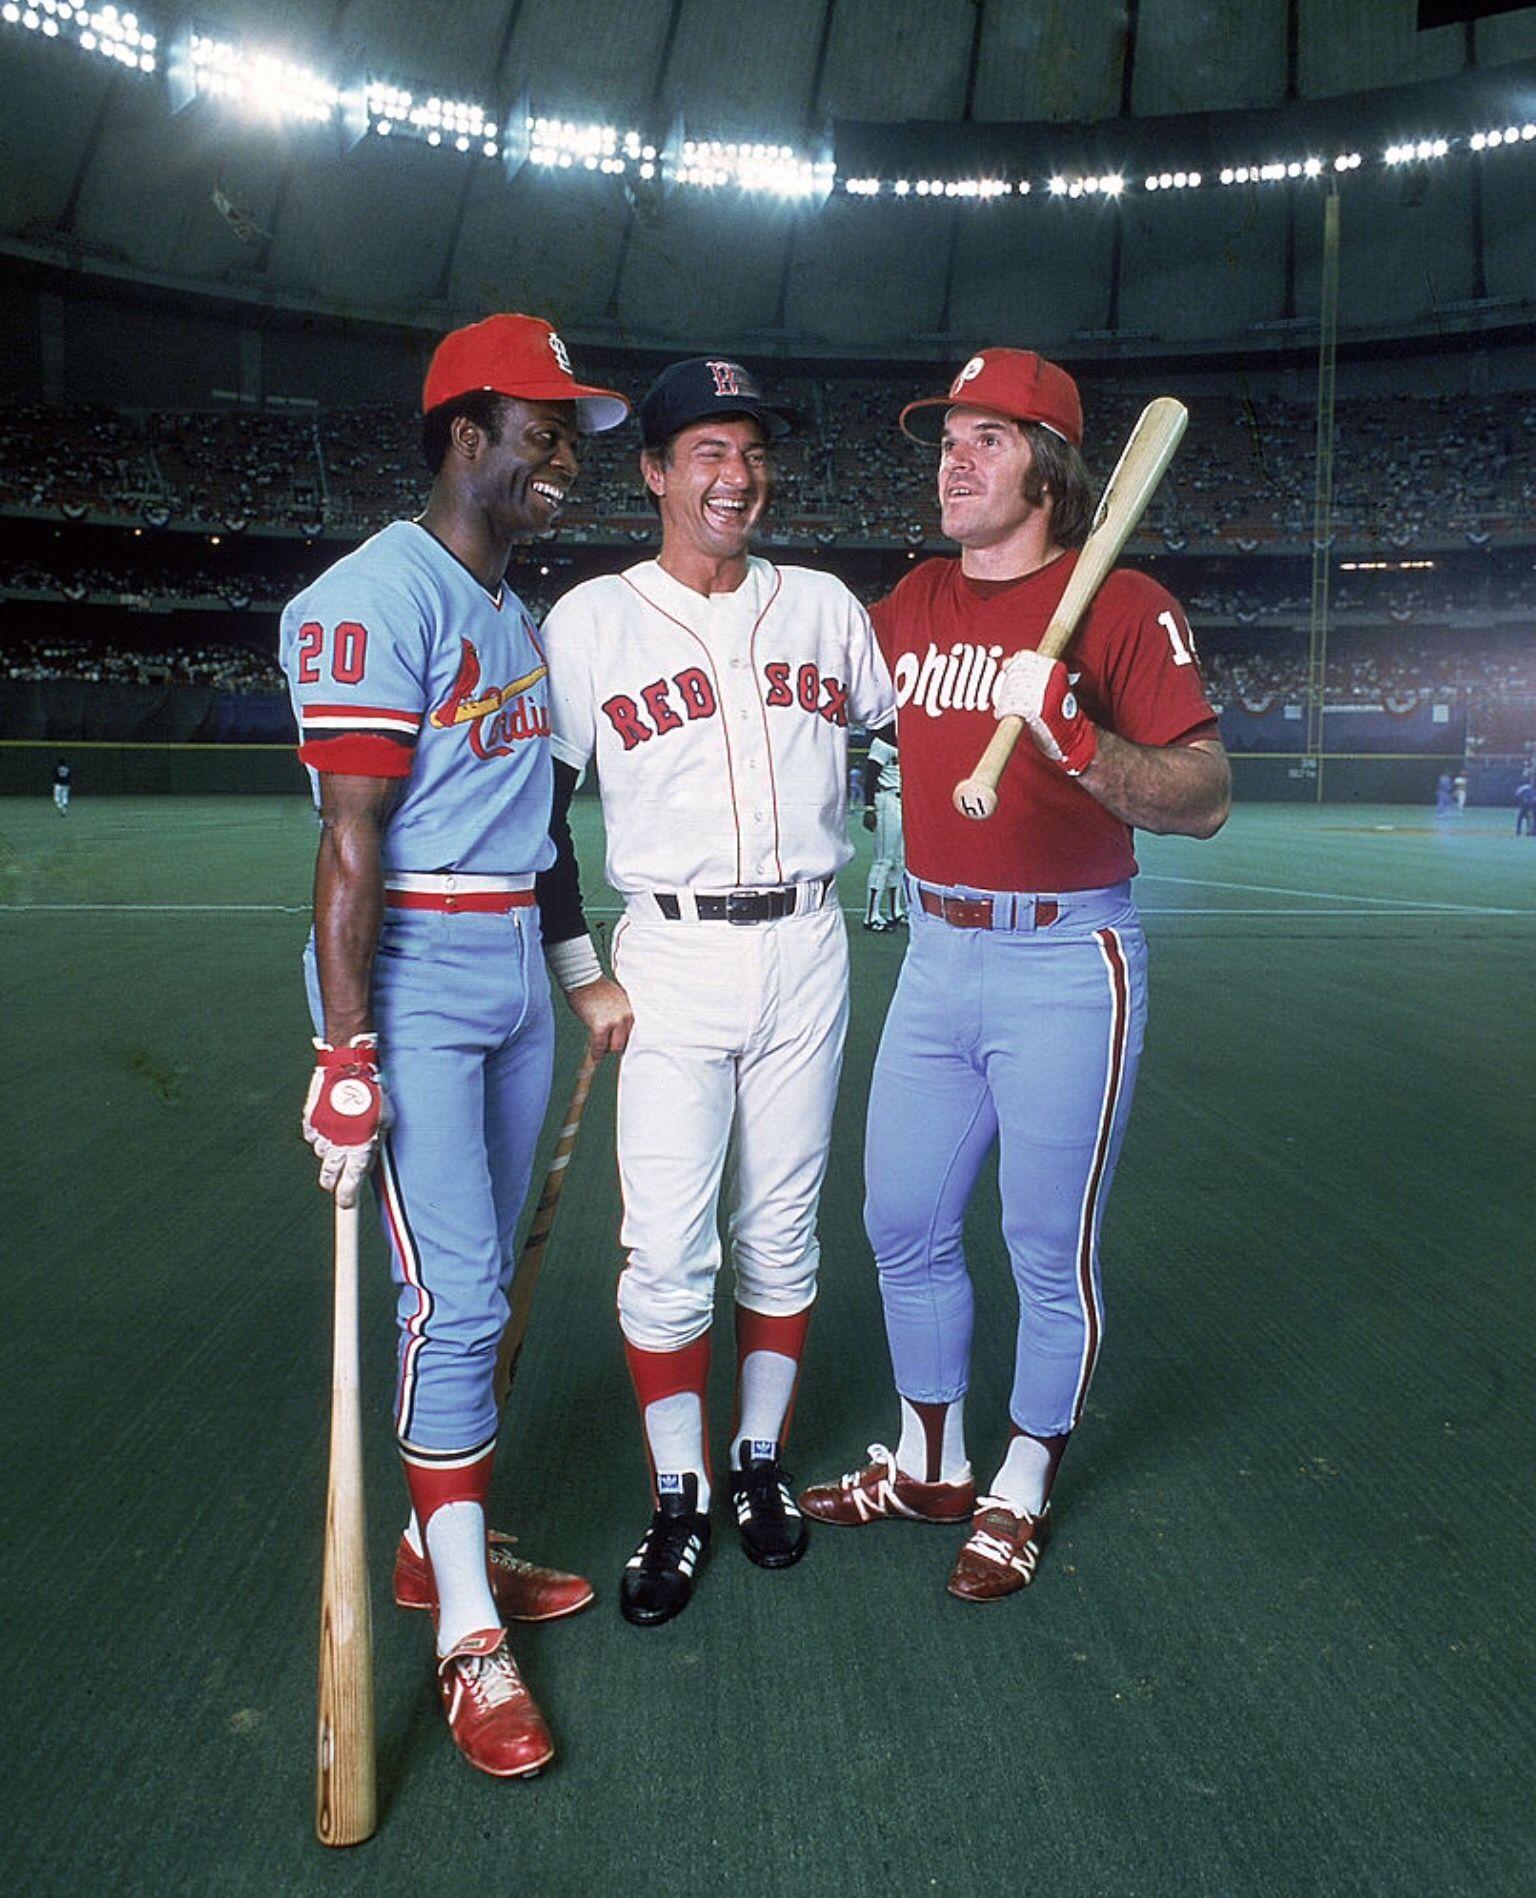 1979 All Star Game Lou Brock Carl Yaztremski Pete Rose Pete Rose Carl Yastrzemski Baseball Star